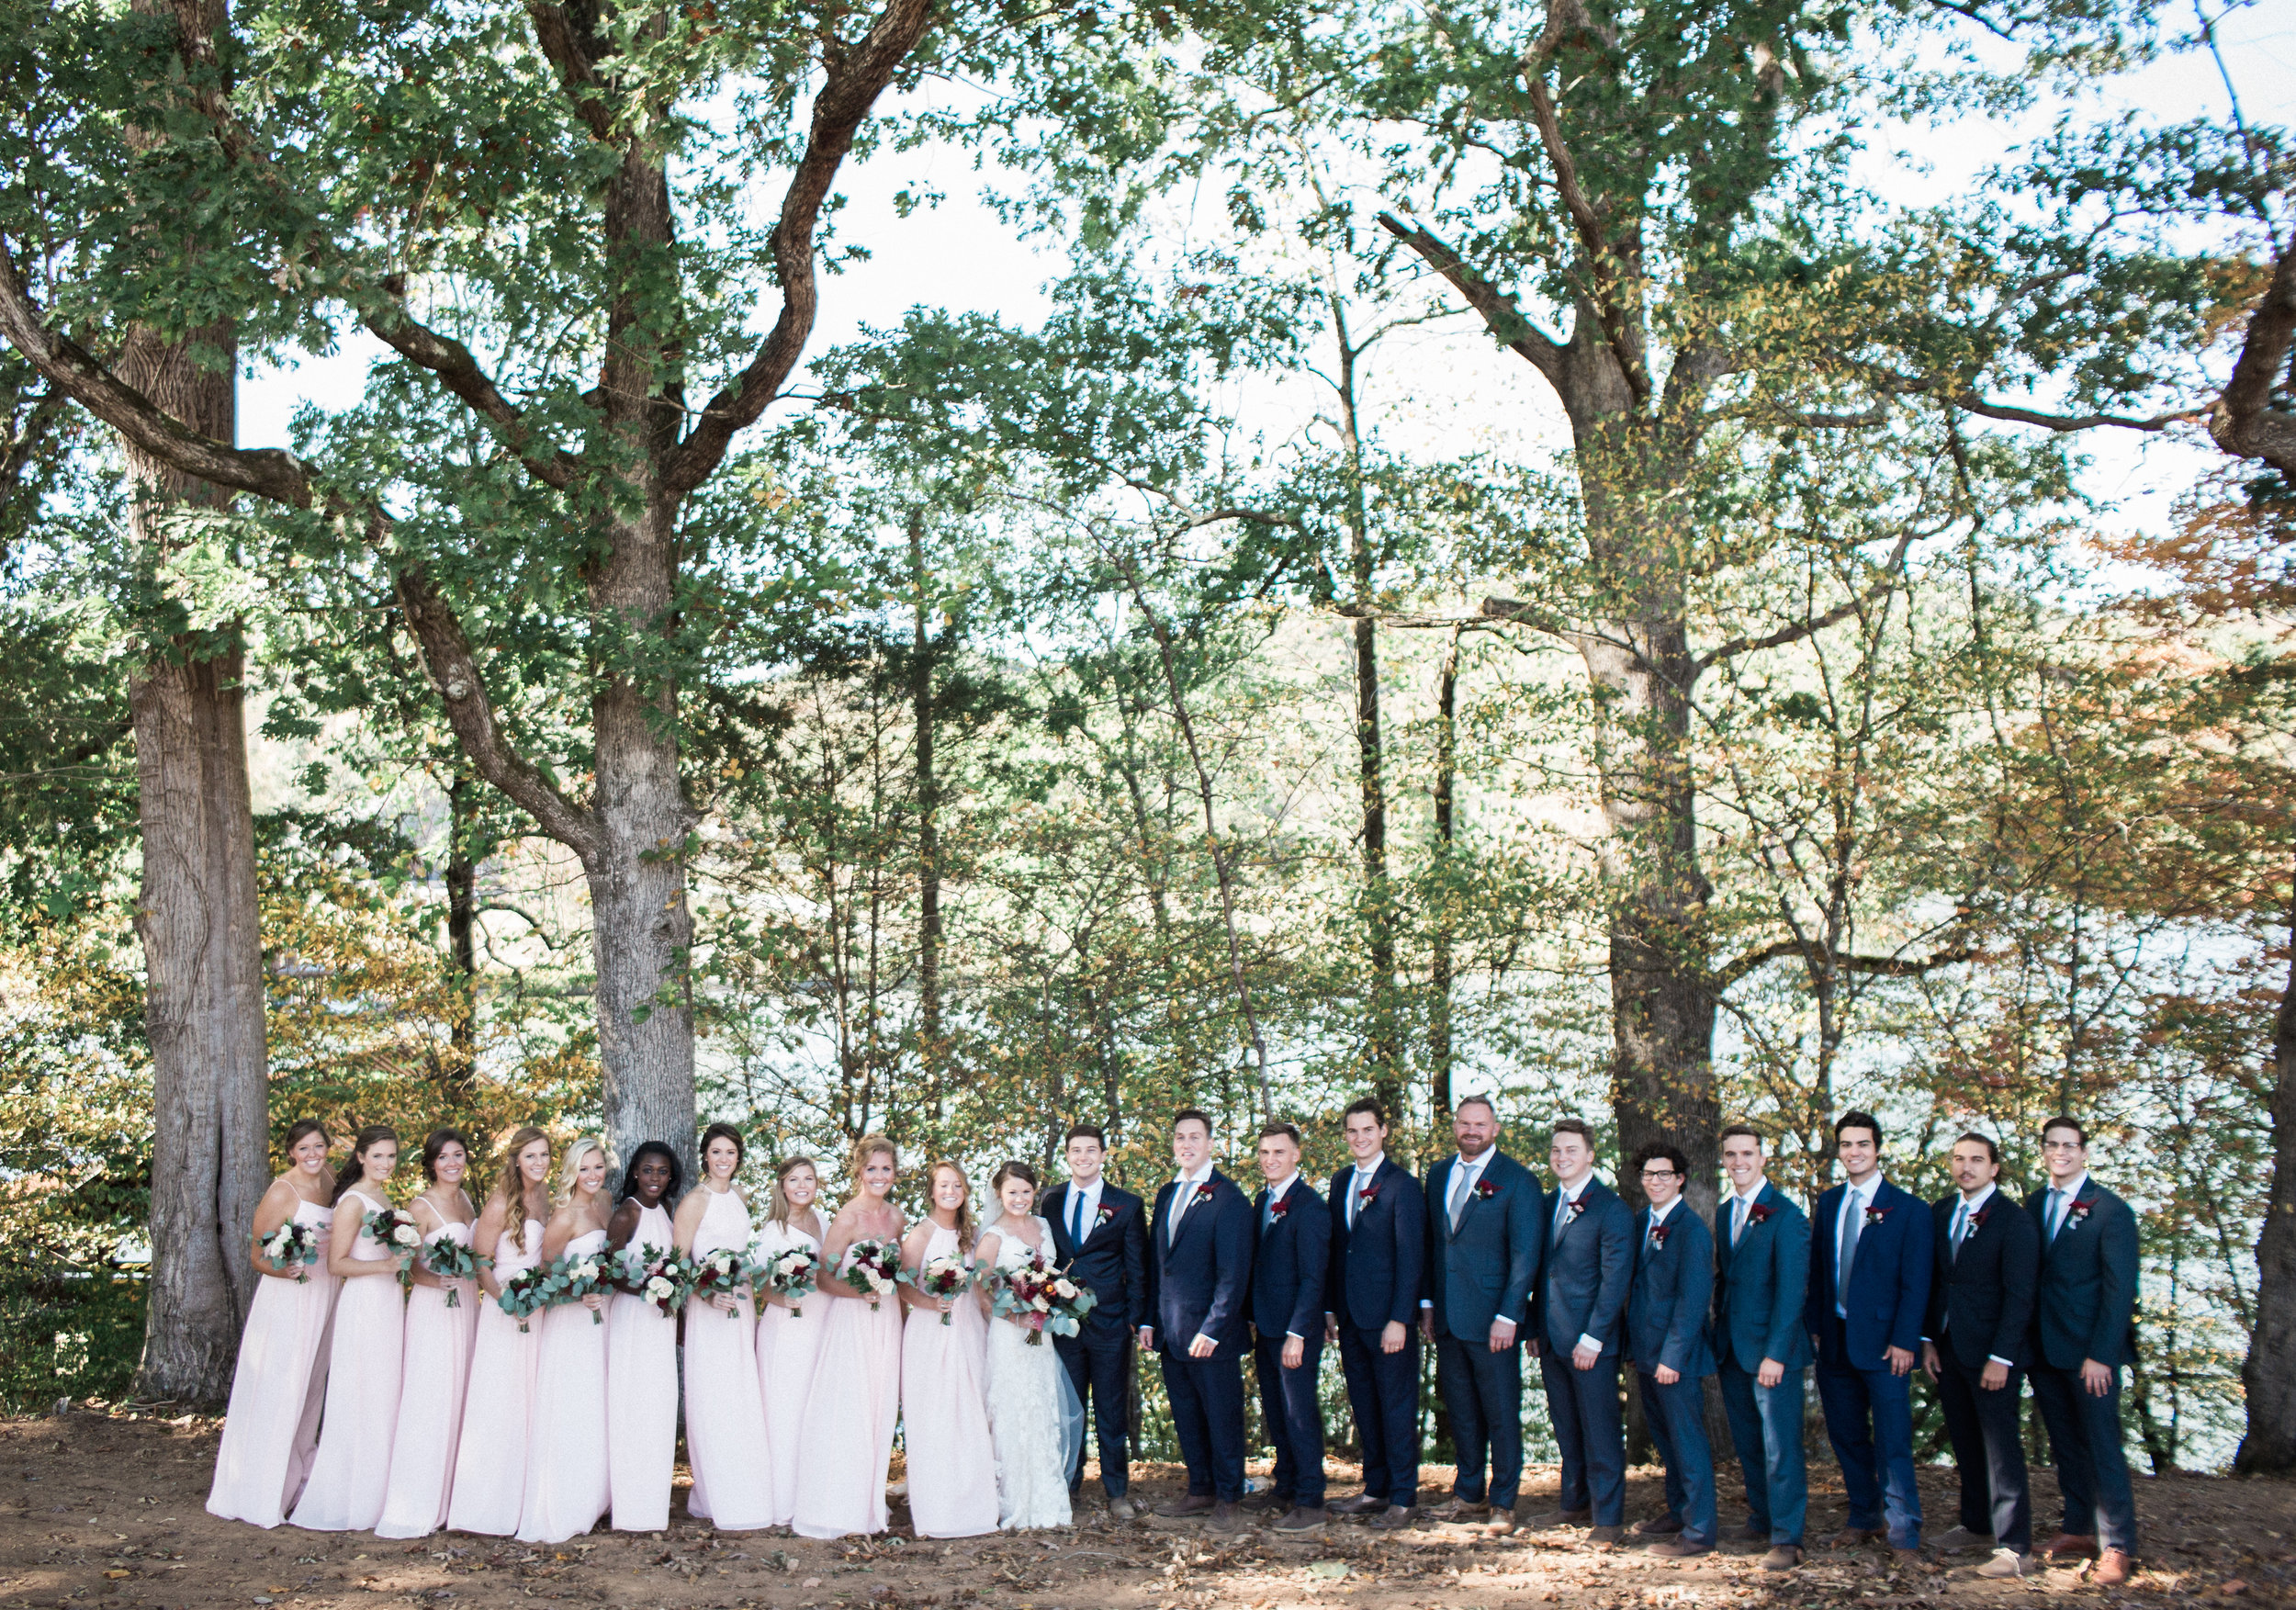 Mikaela Hamilton-Hannah & Joe- bridal party-46.jpg